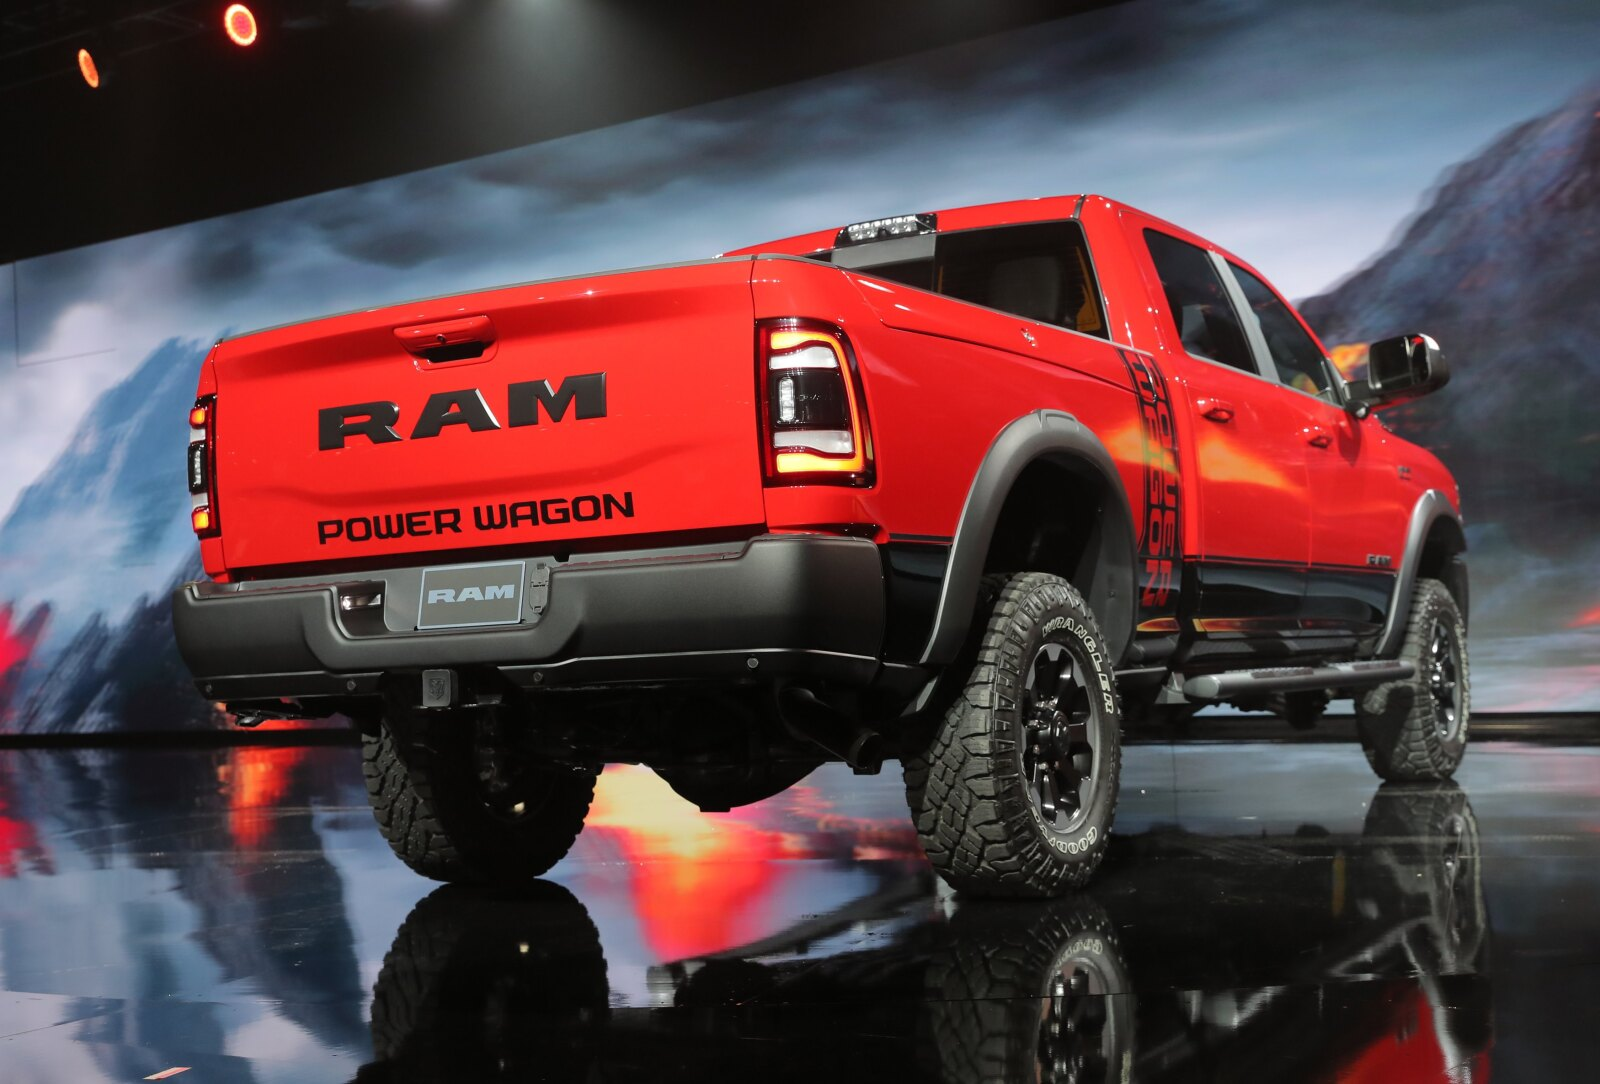 RAM Power Wagon pick up